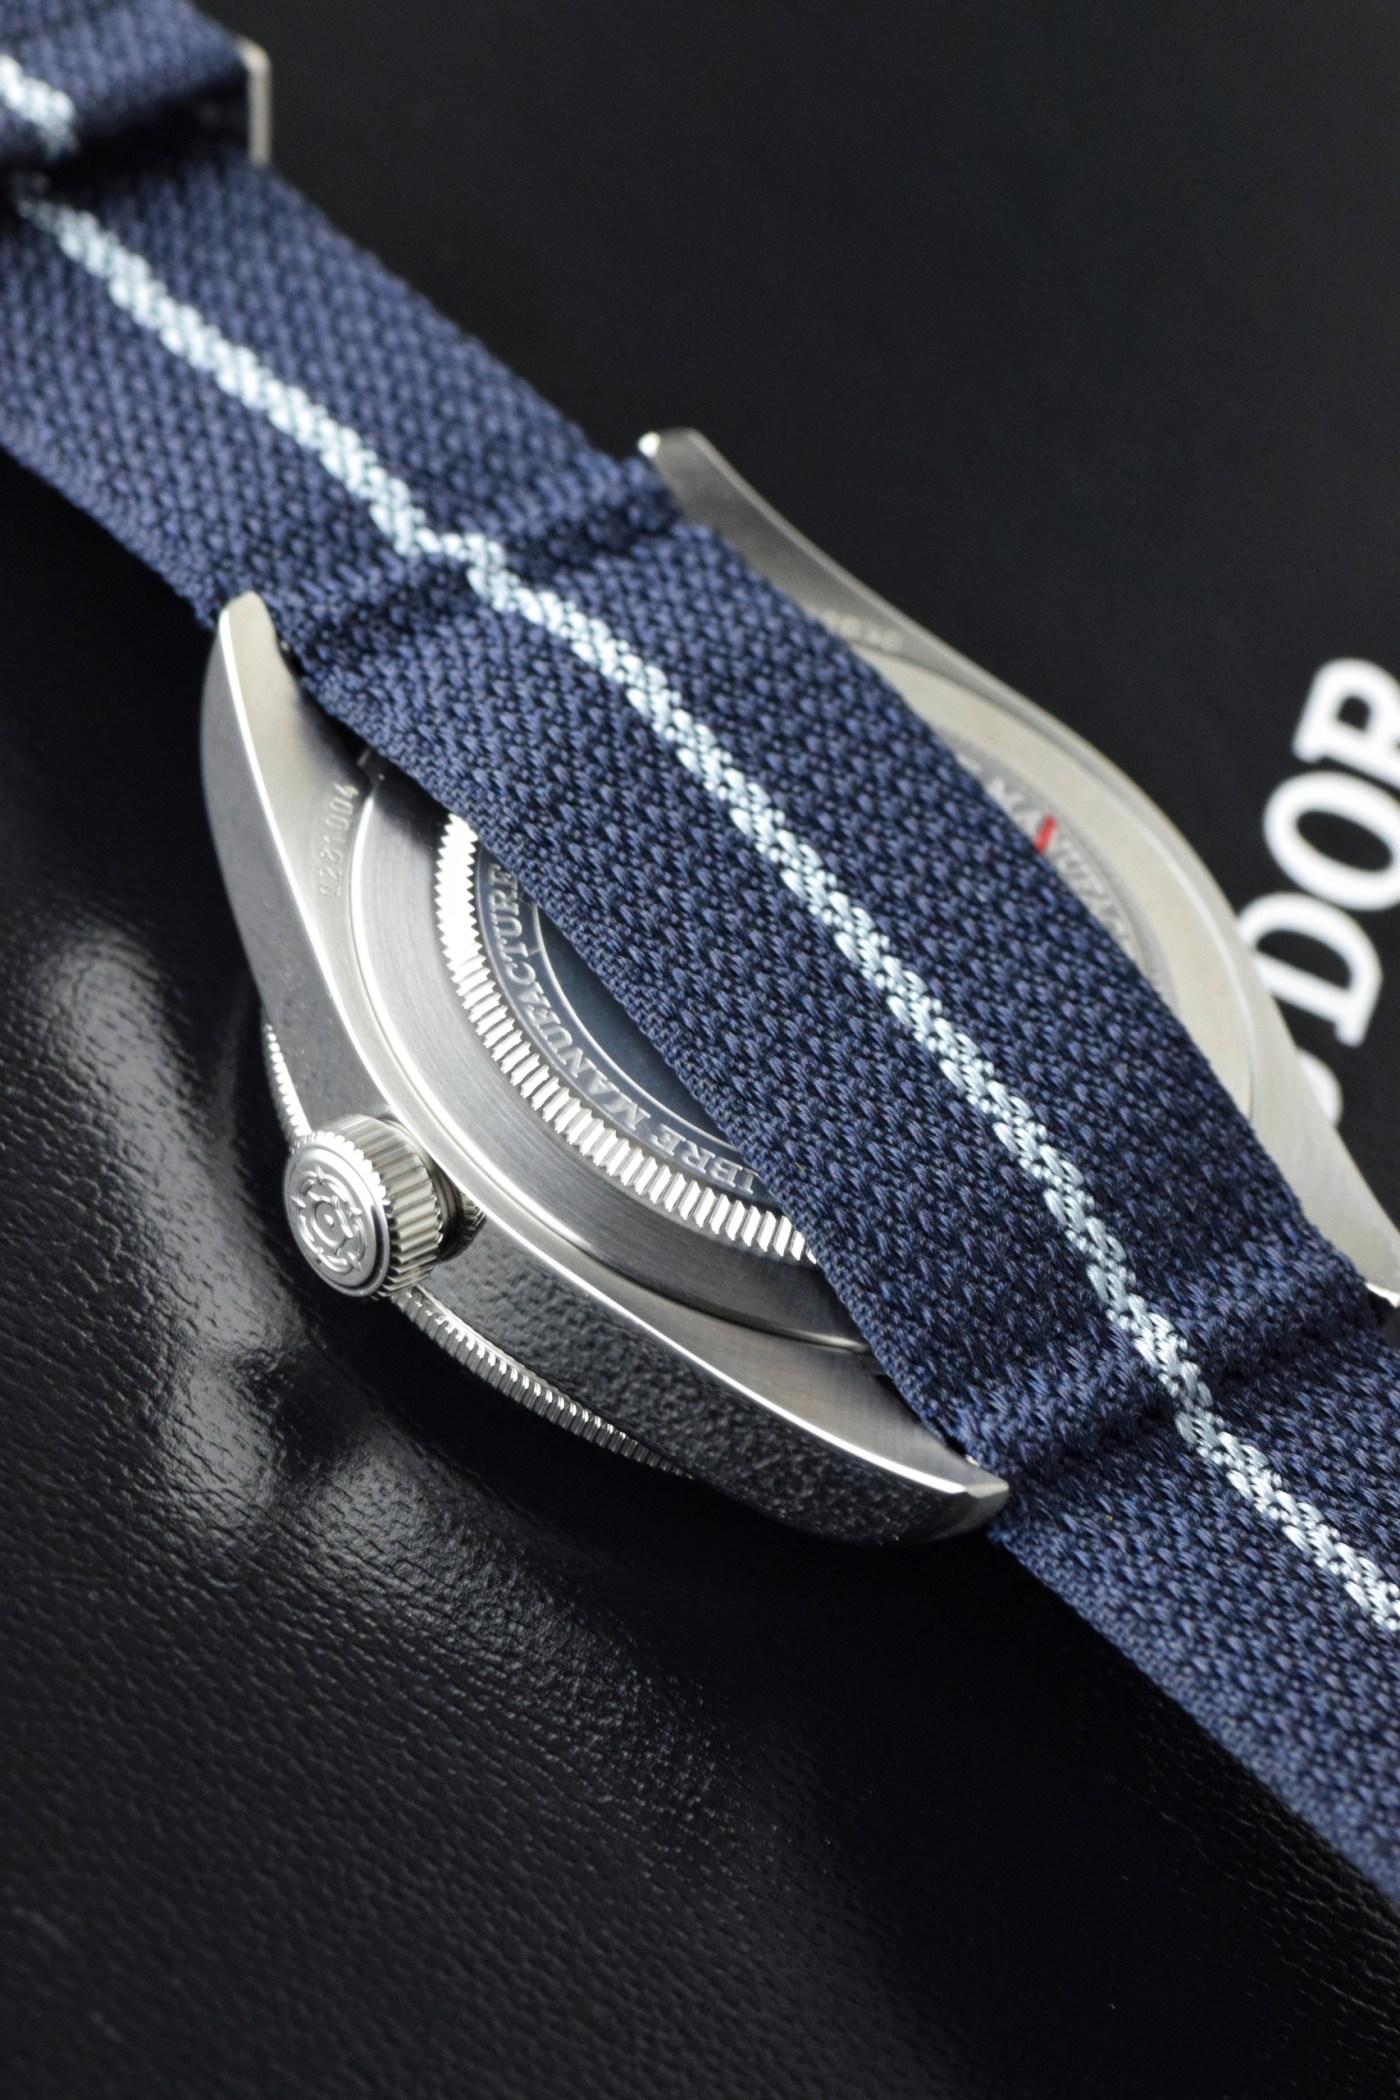 Tudor Black Bay Fifty-Eight Navy Blue Ref. 79030B caseback